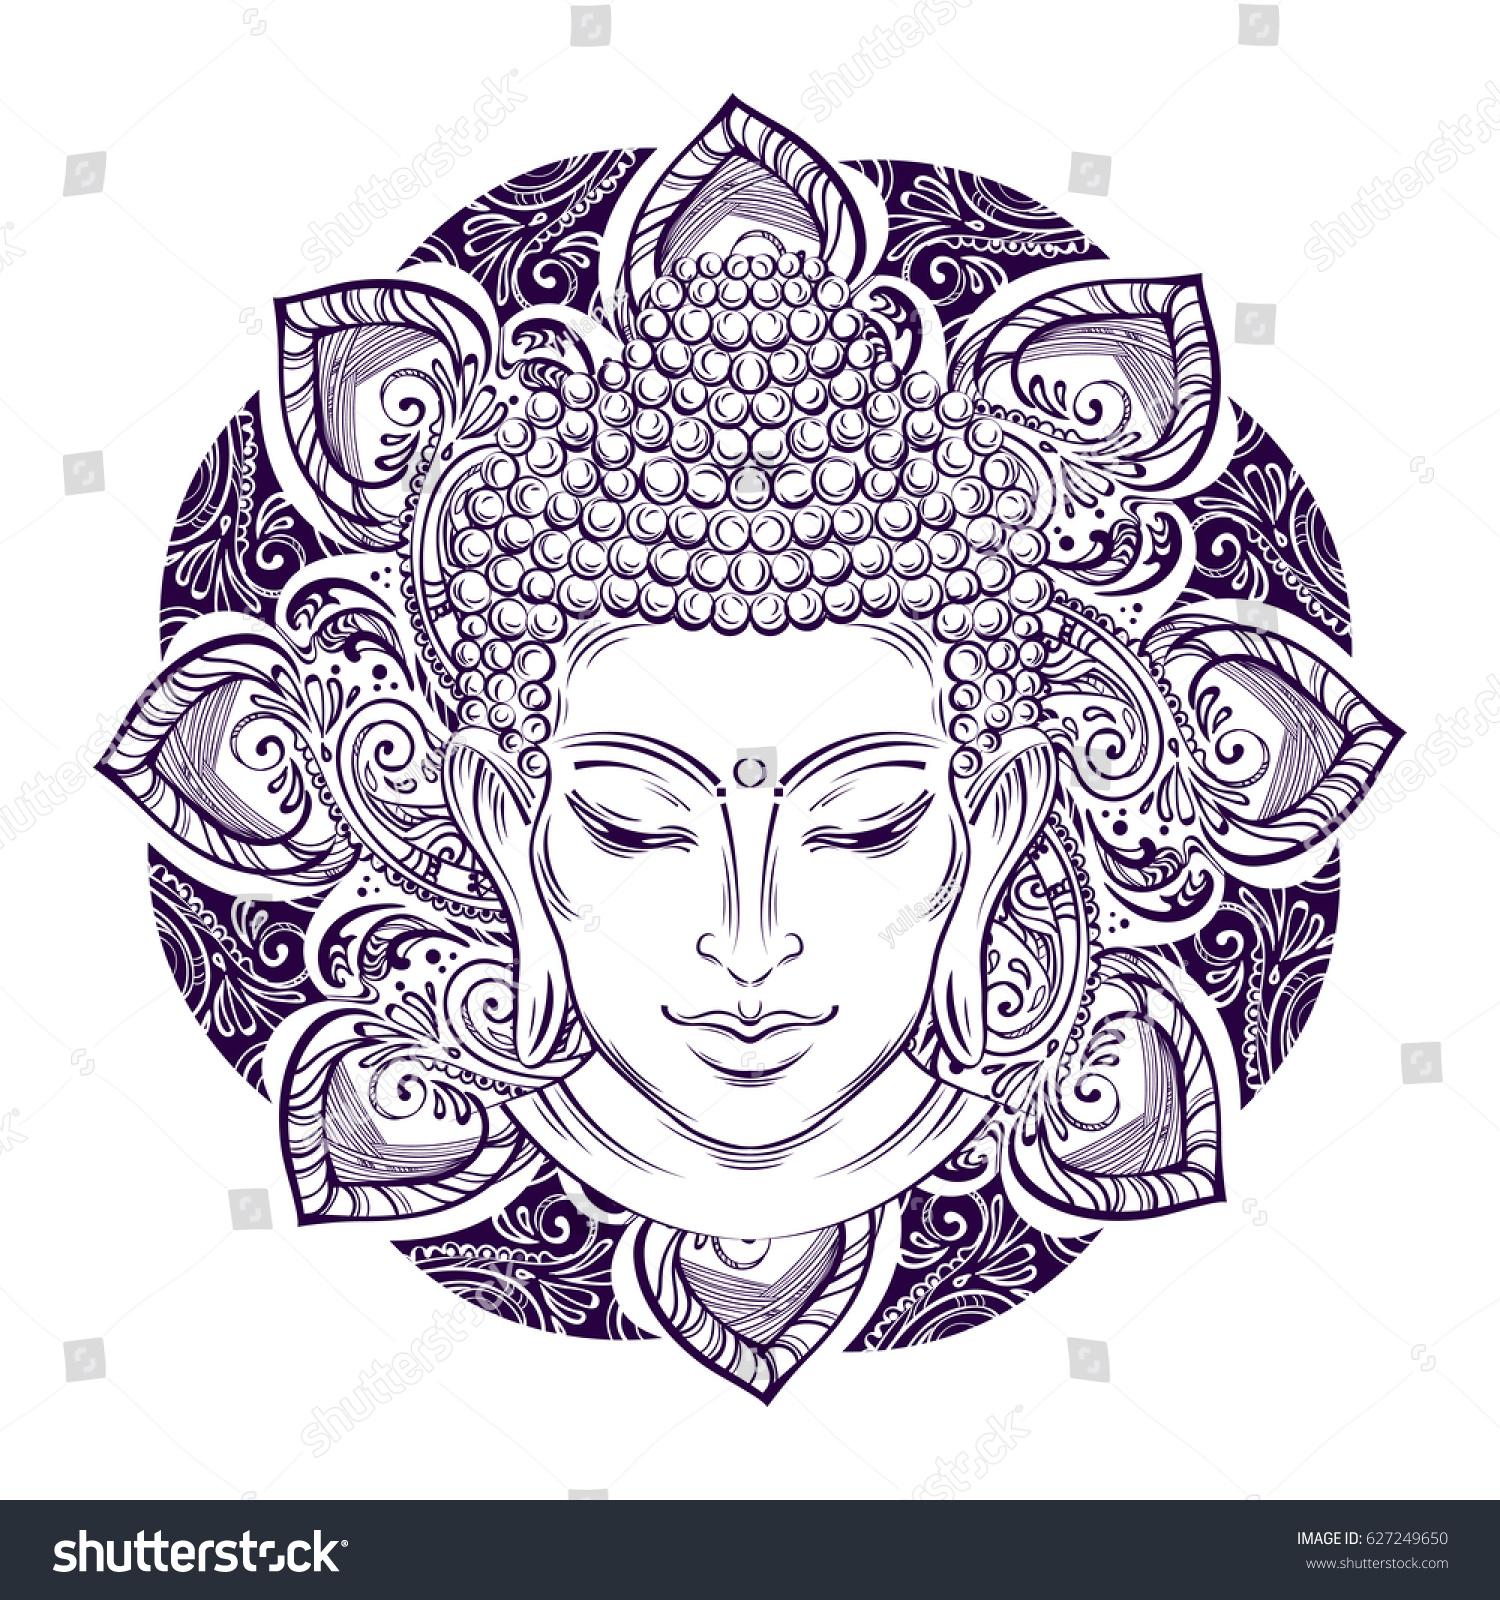 Buddha head paisley ornament mehendi symbol stock vector 627249650 buddha head with paisley ornament mehendi the symbol of hinduism buddhism spirituality buycottarizona Image collections